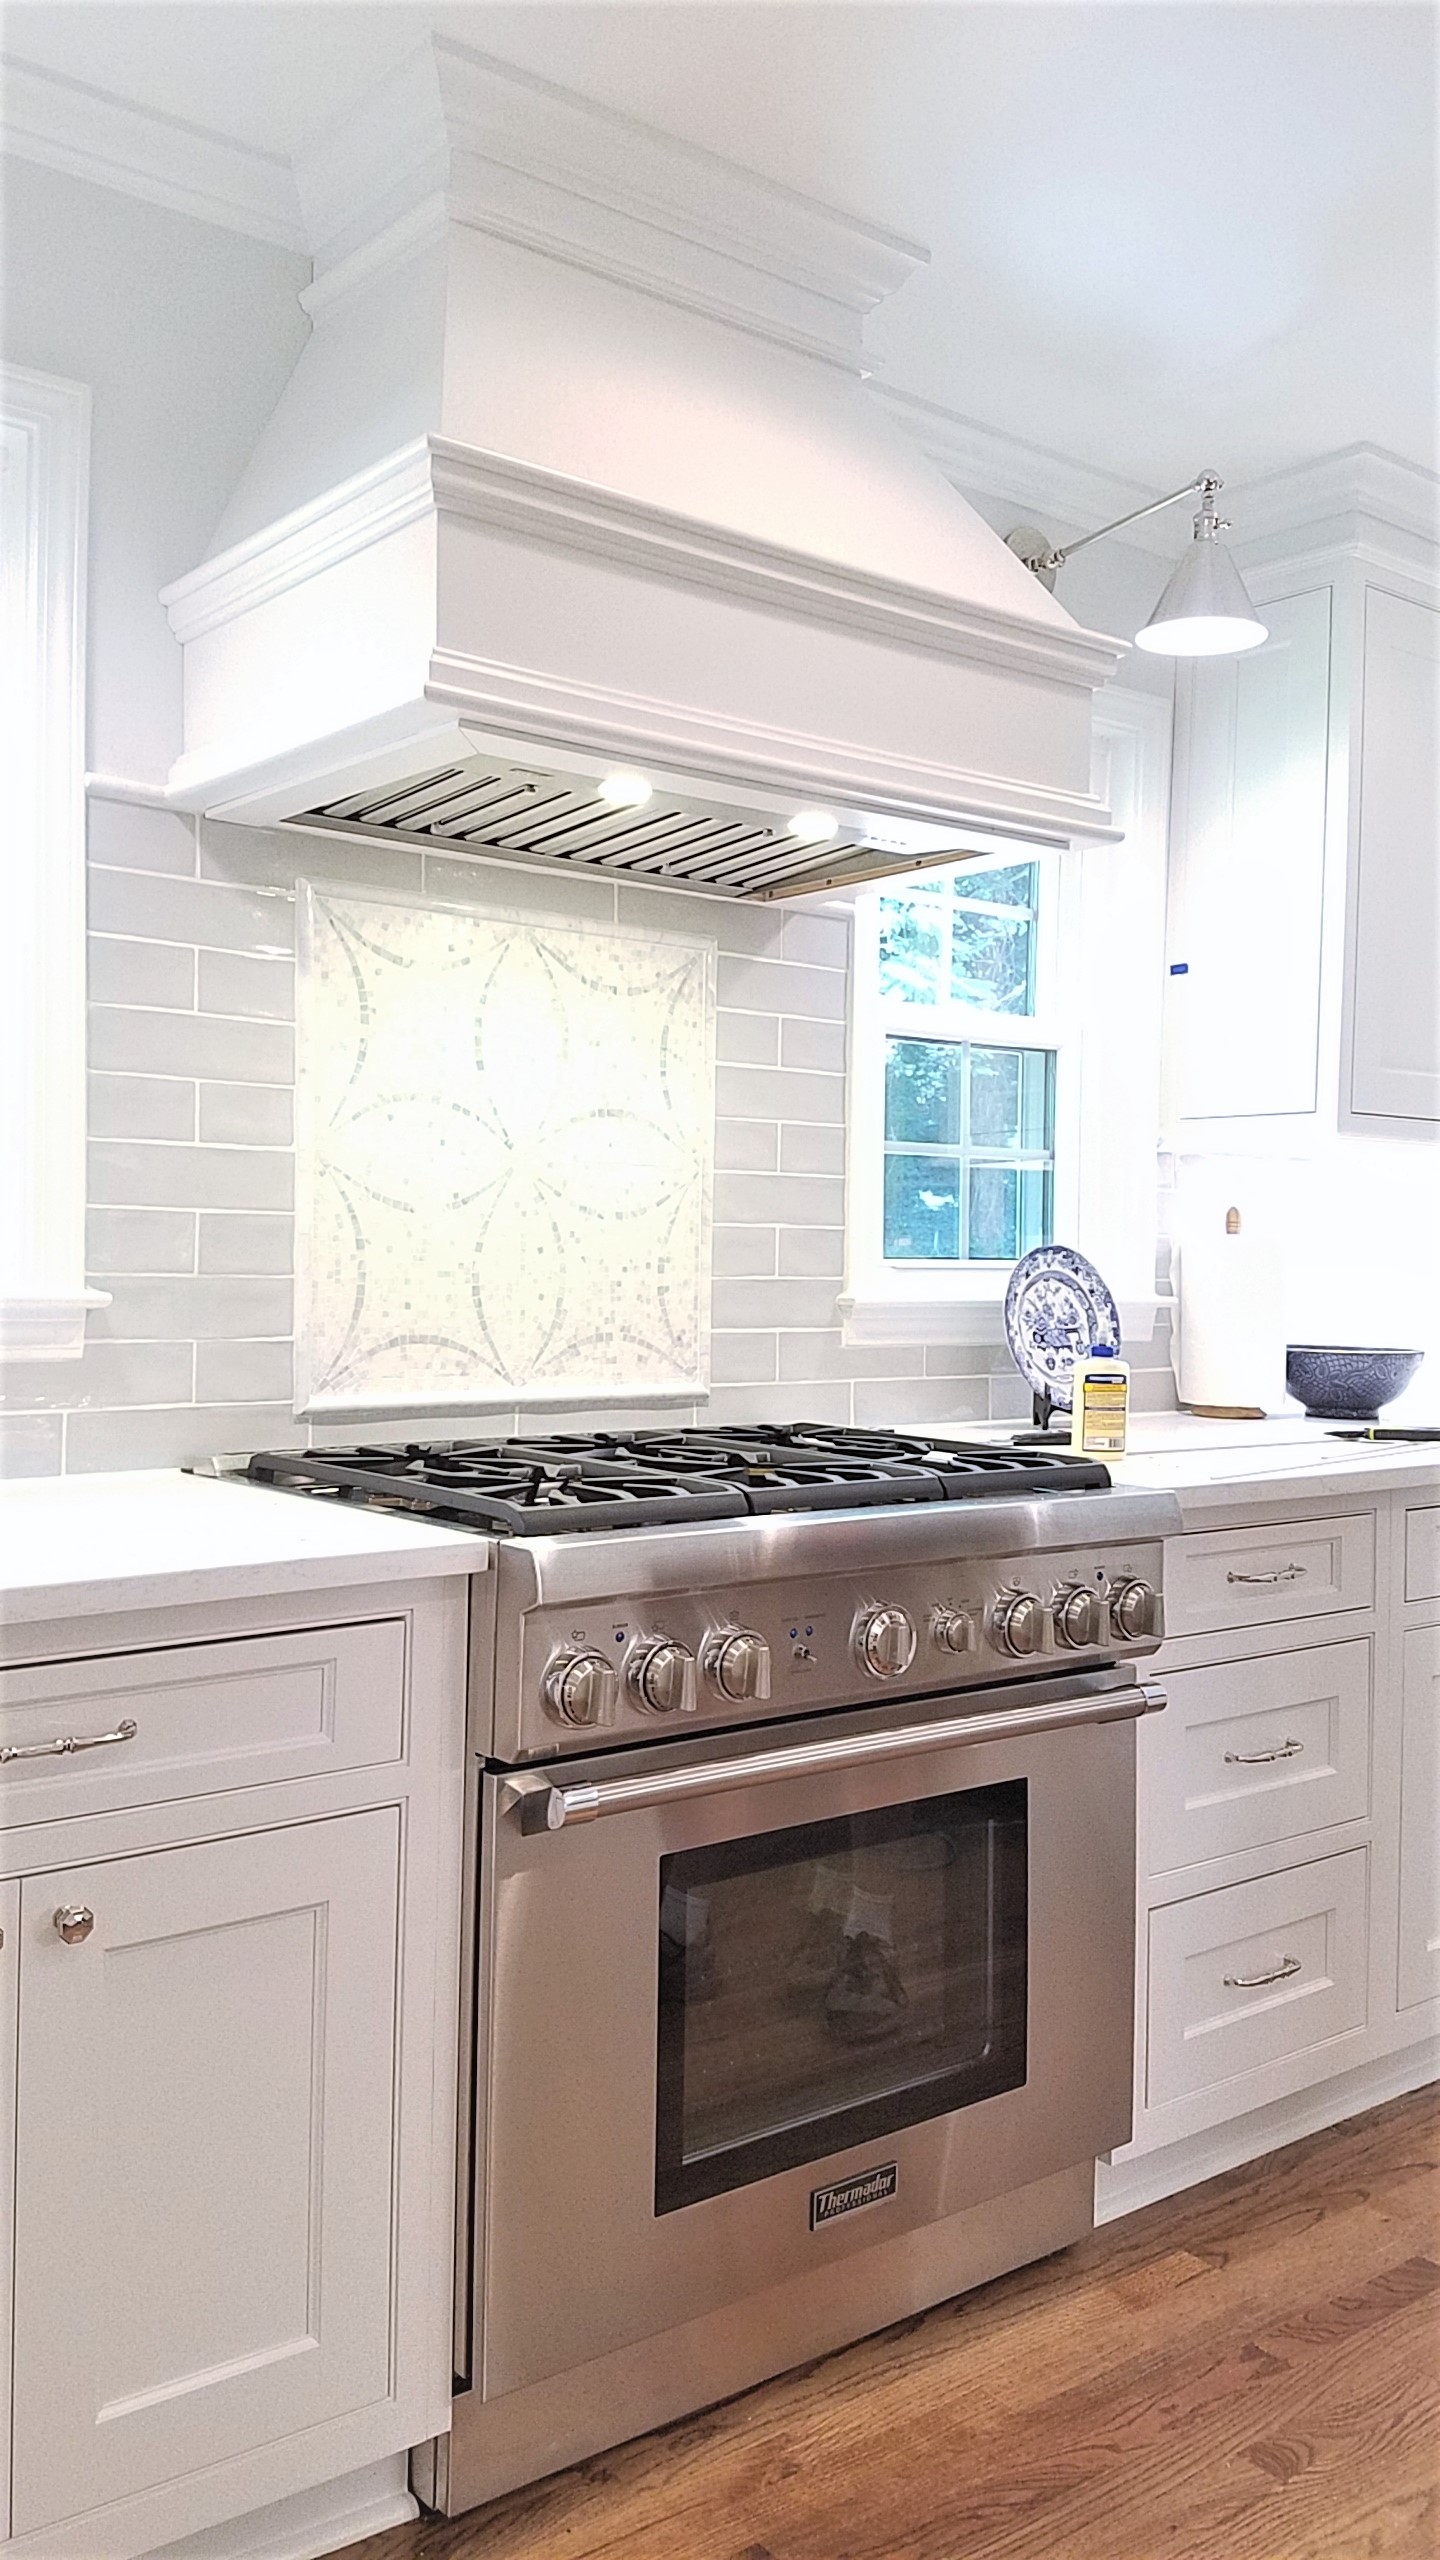 LUXE Homes Pro 026 kitchen range hood.jpg